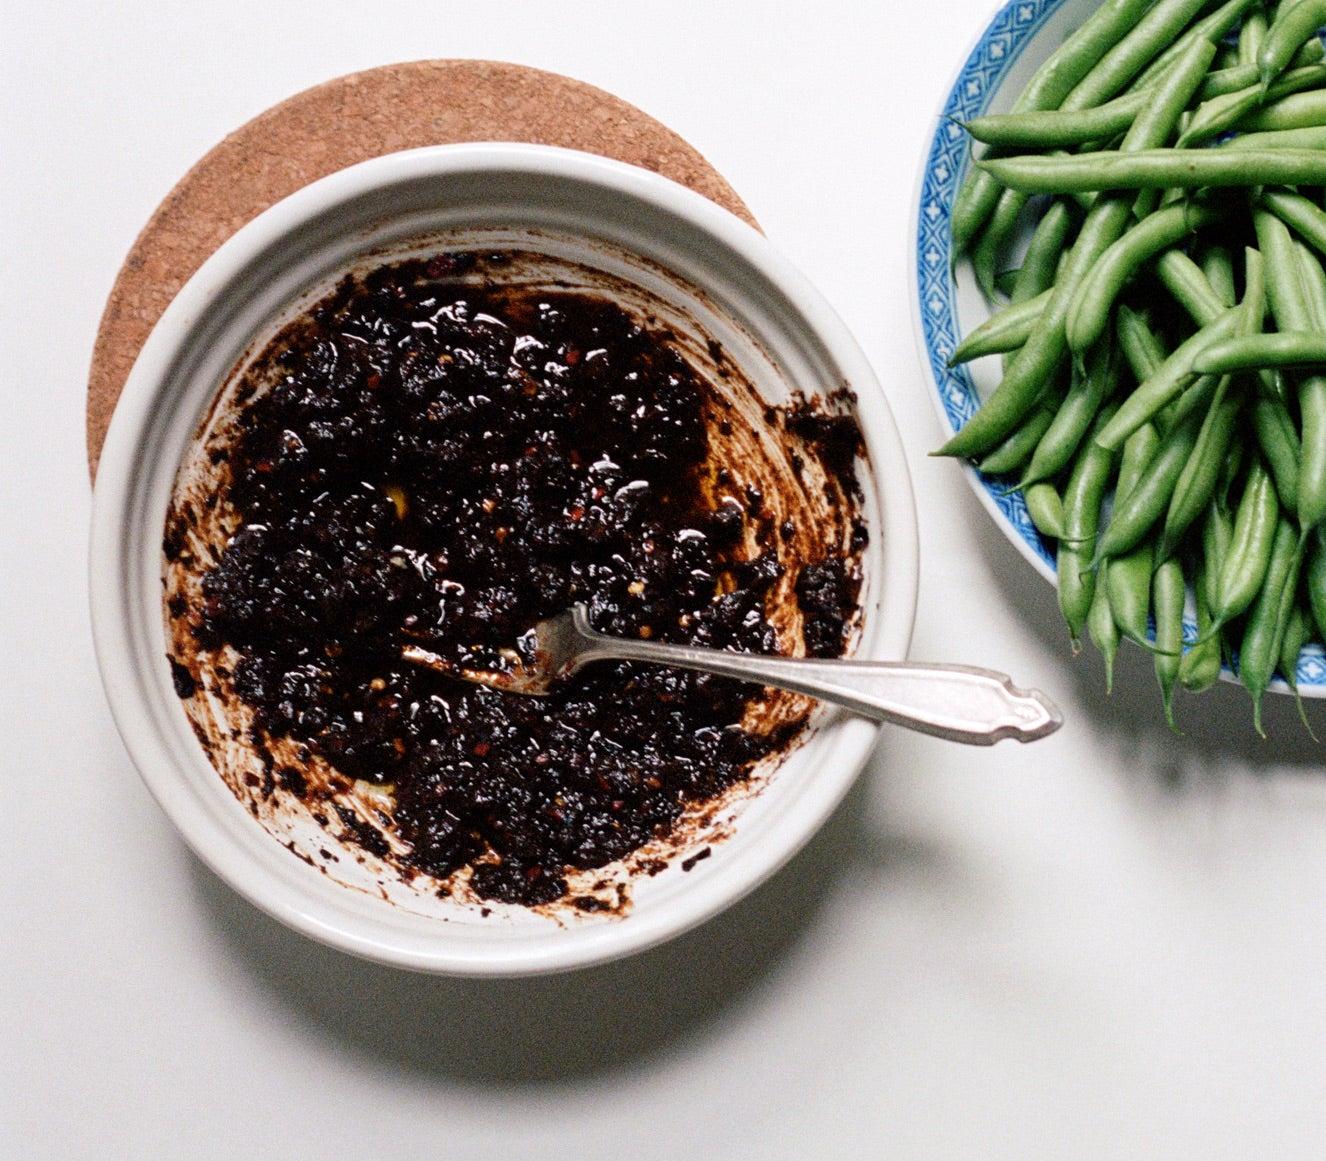 Fermented Black Bean Sauce